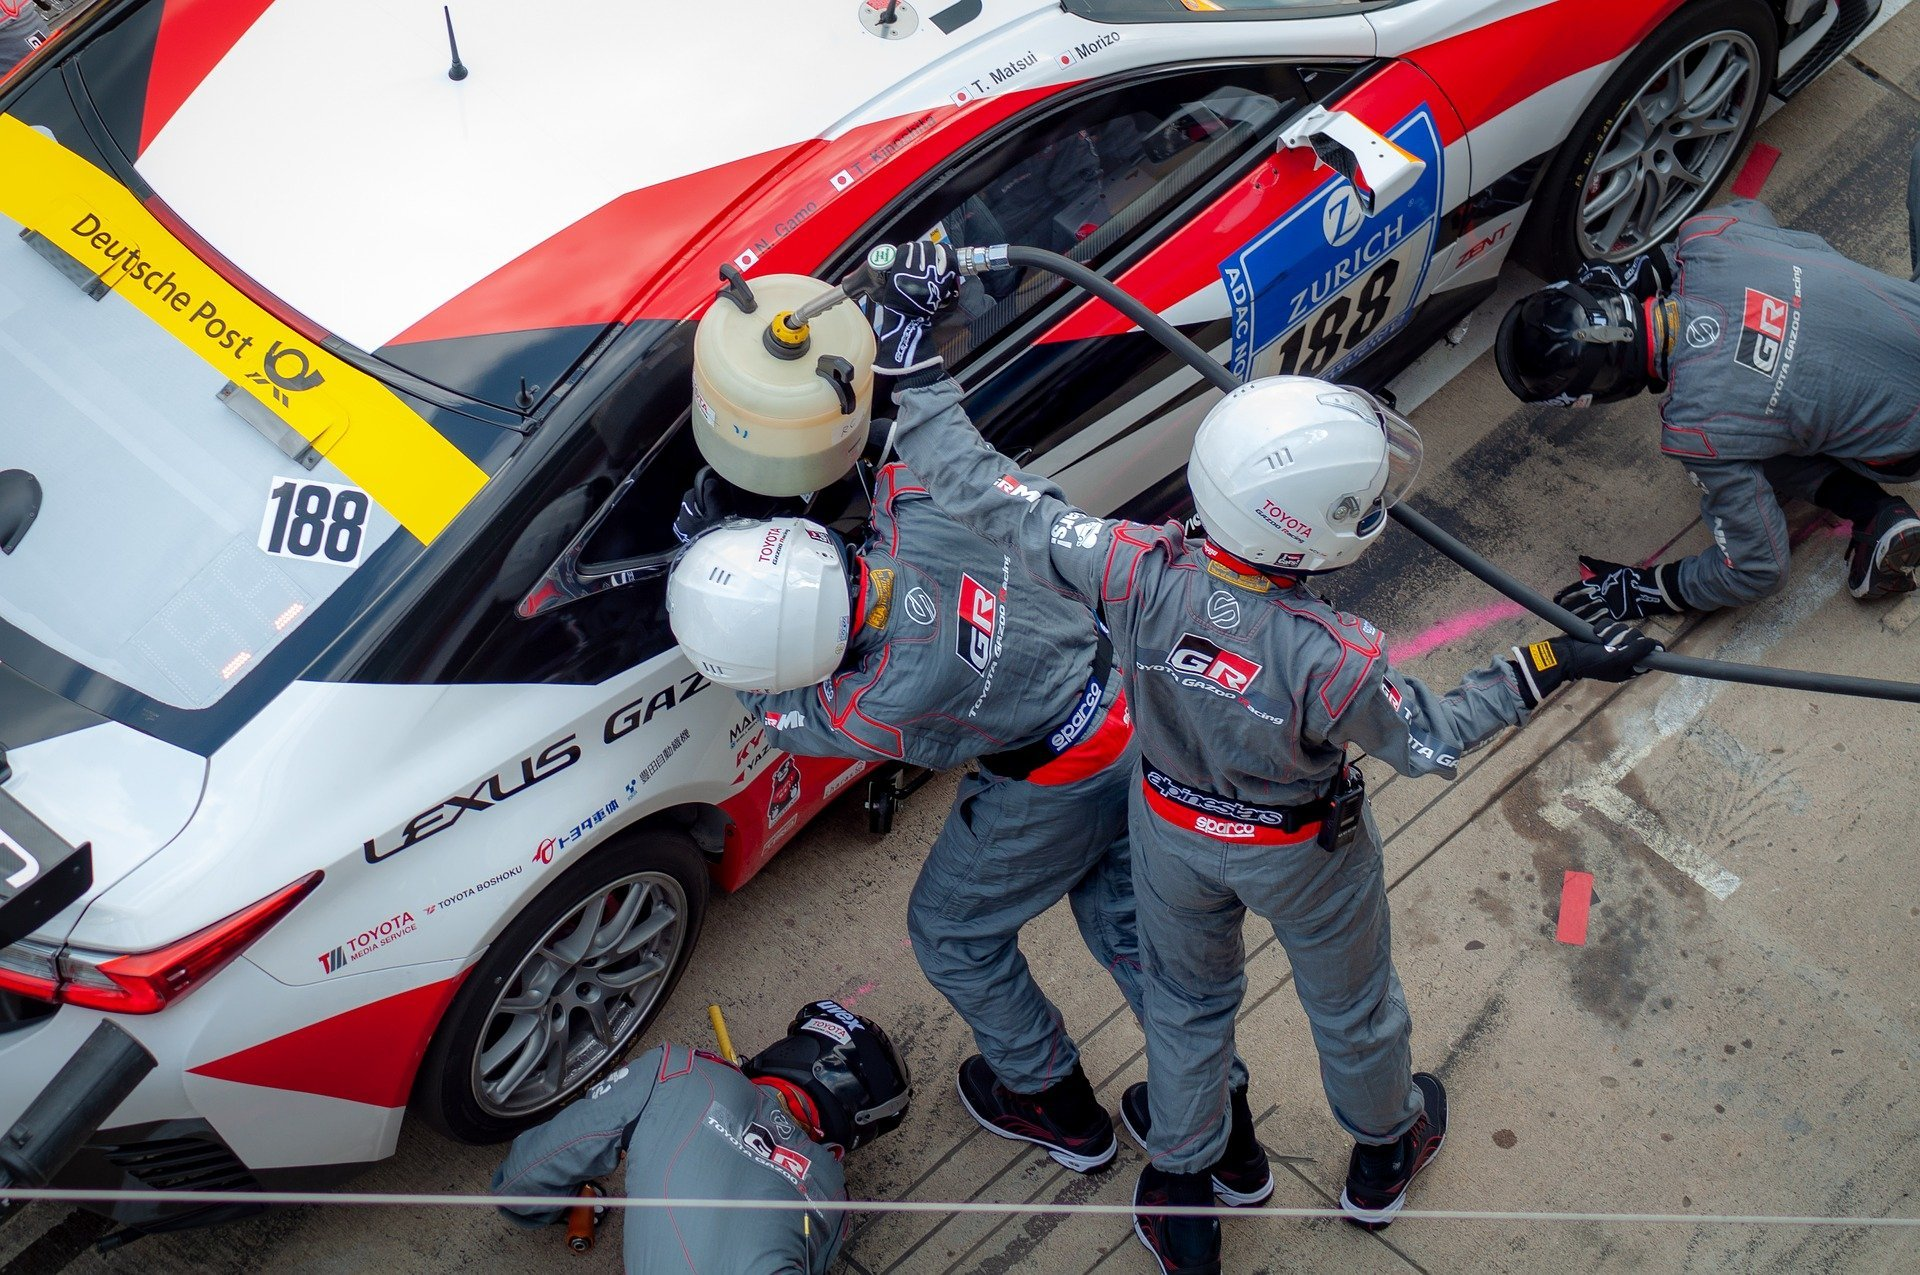 Data Center Deployment: When Life Gives you Lemons,<br>Make 'Le Mans-ade'